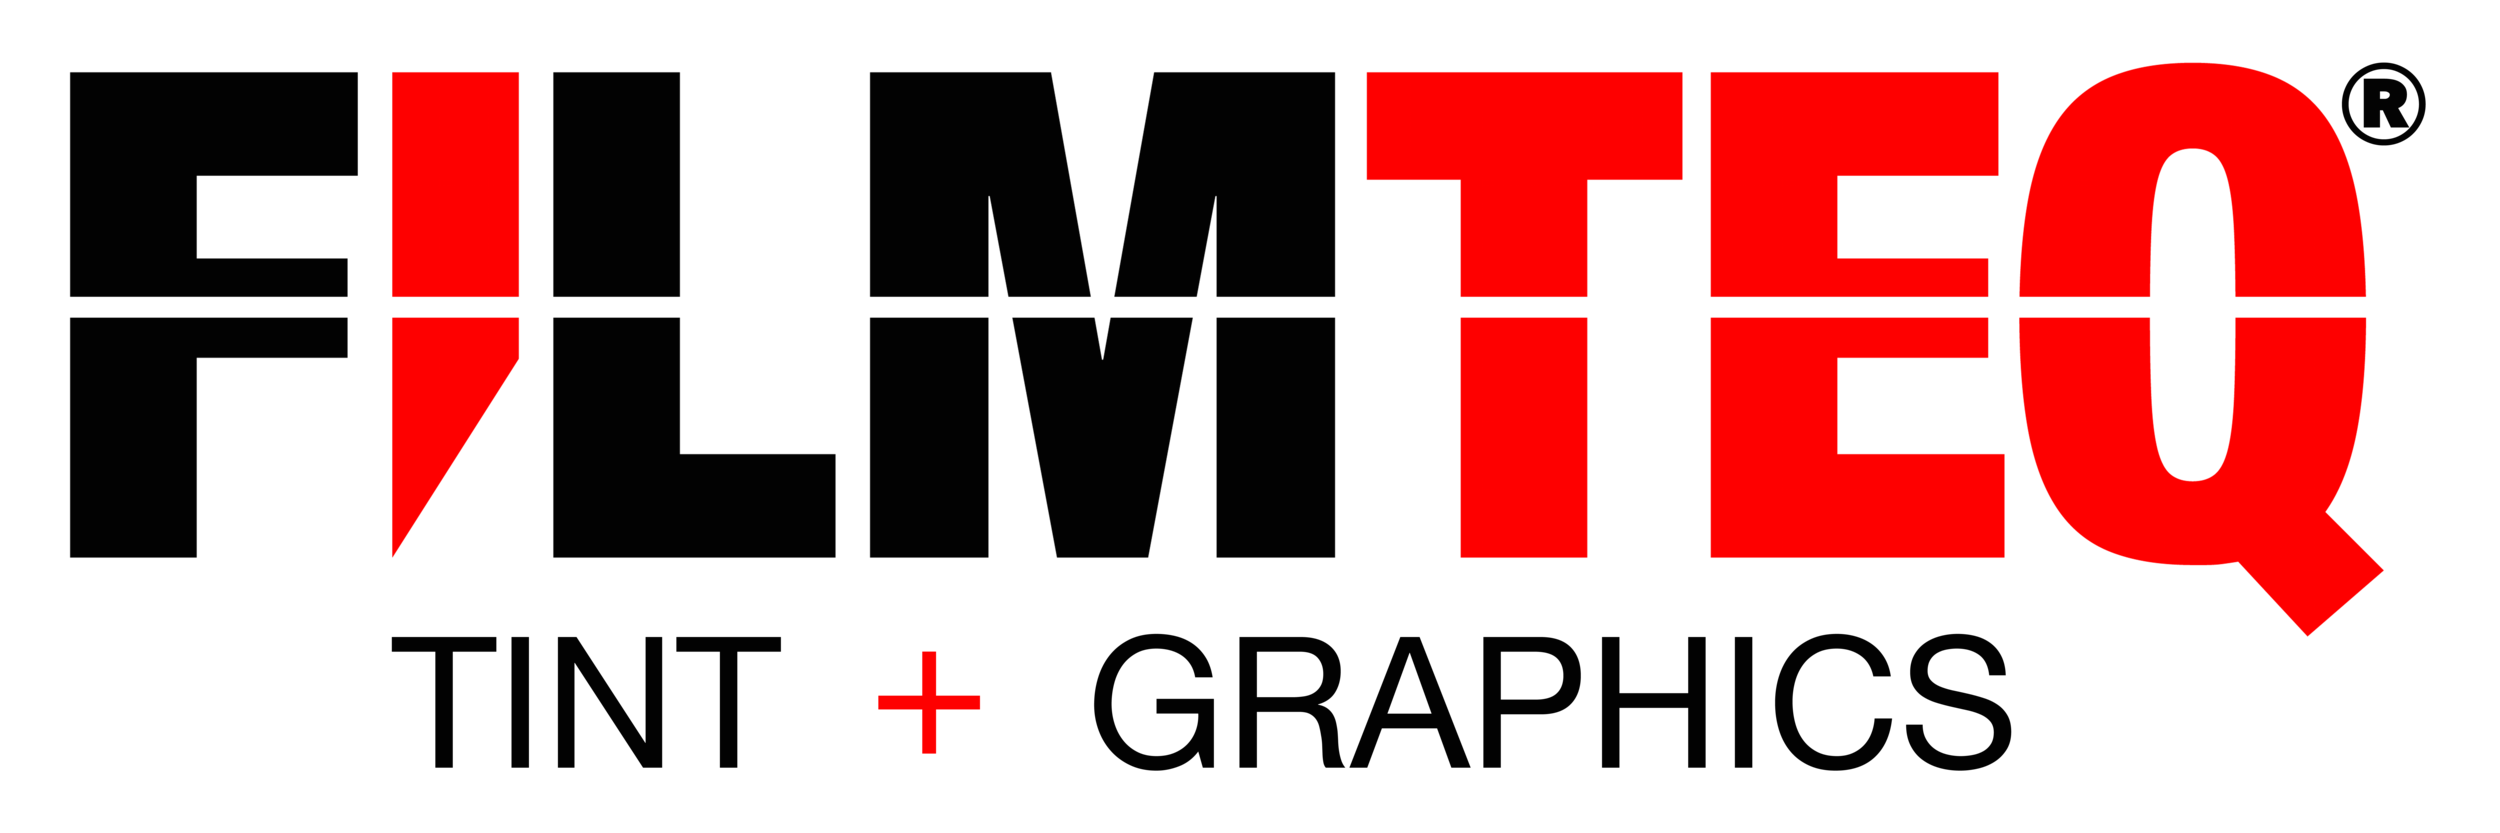 FILMTEQ tint and graphics Trademark LOGO.png